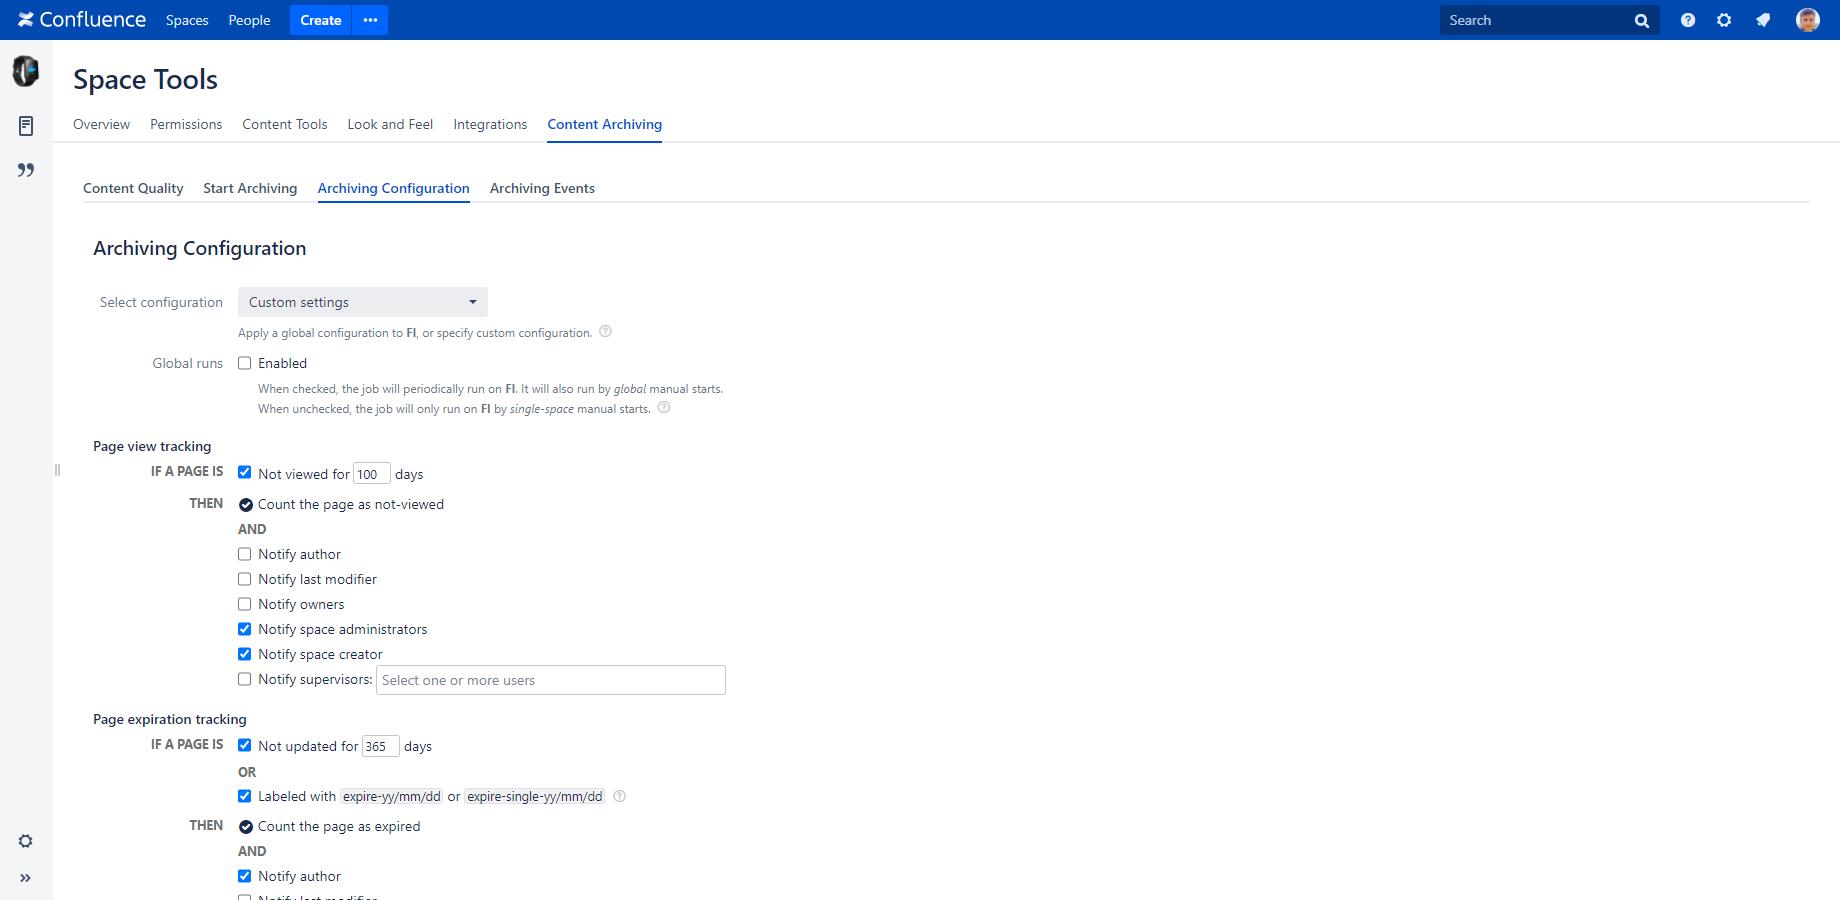 User Manual - Archiving Plugin for Confluence | Midori